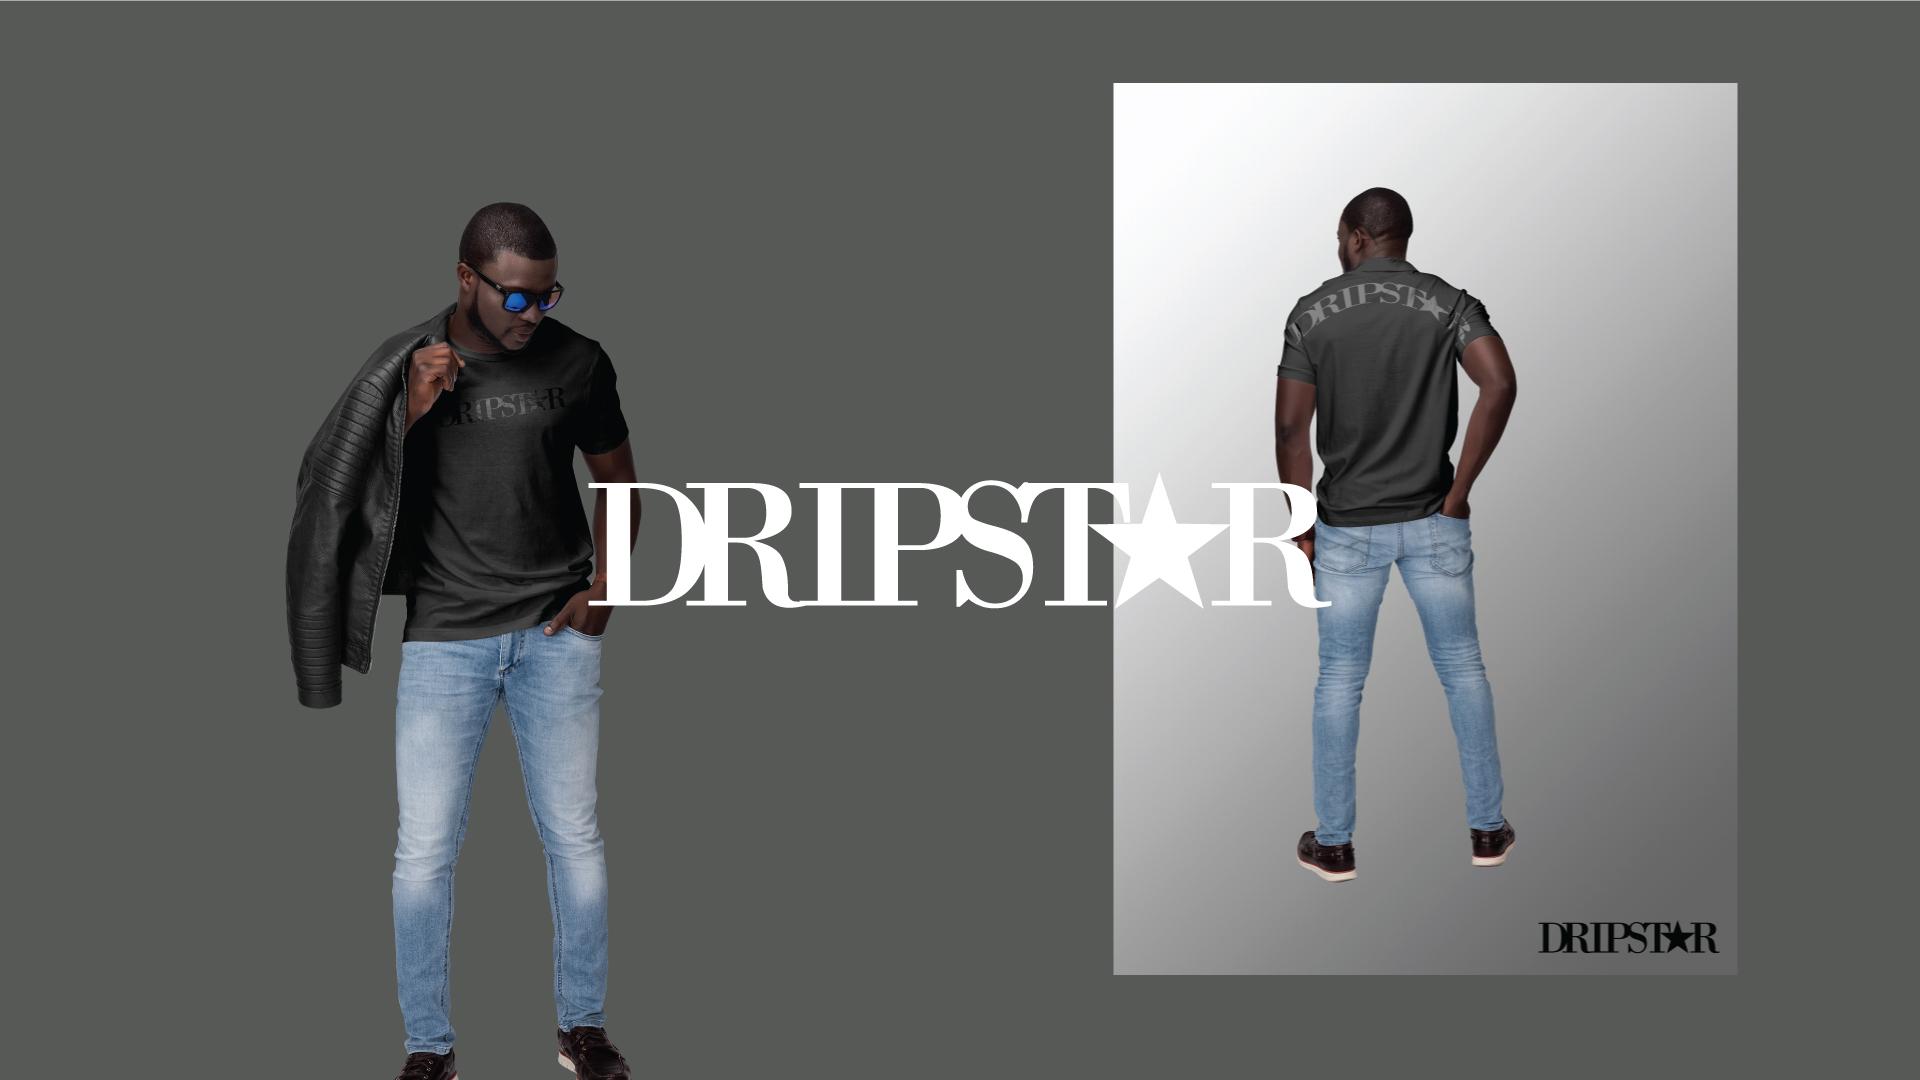 Dripstar Apparel